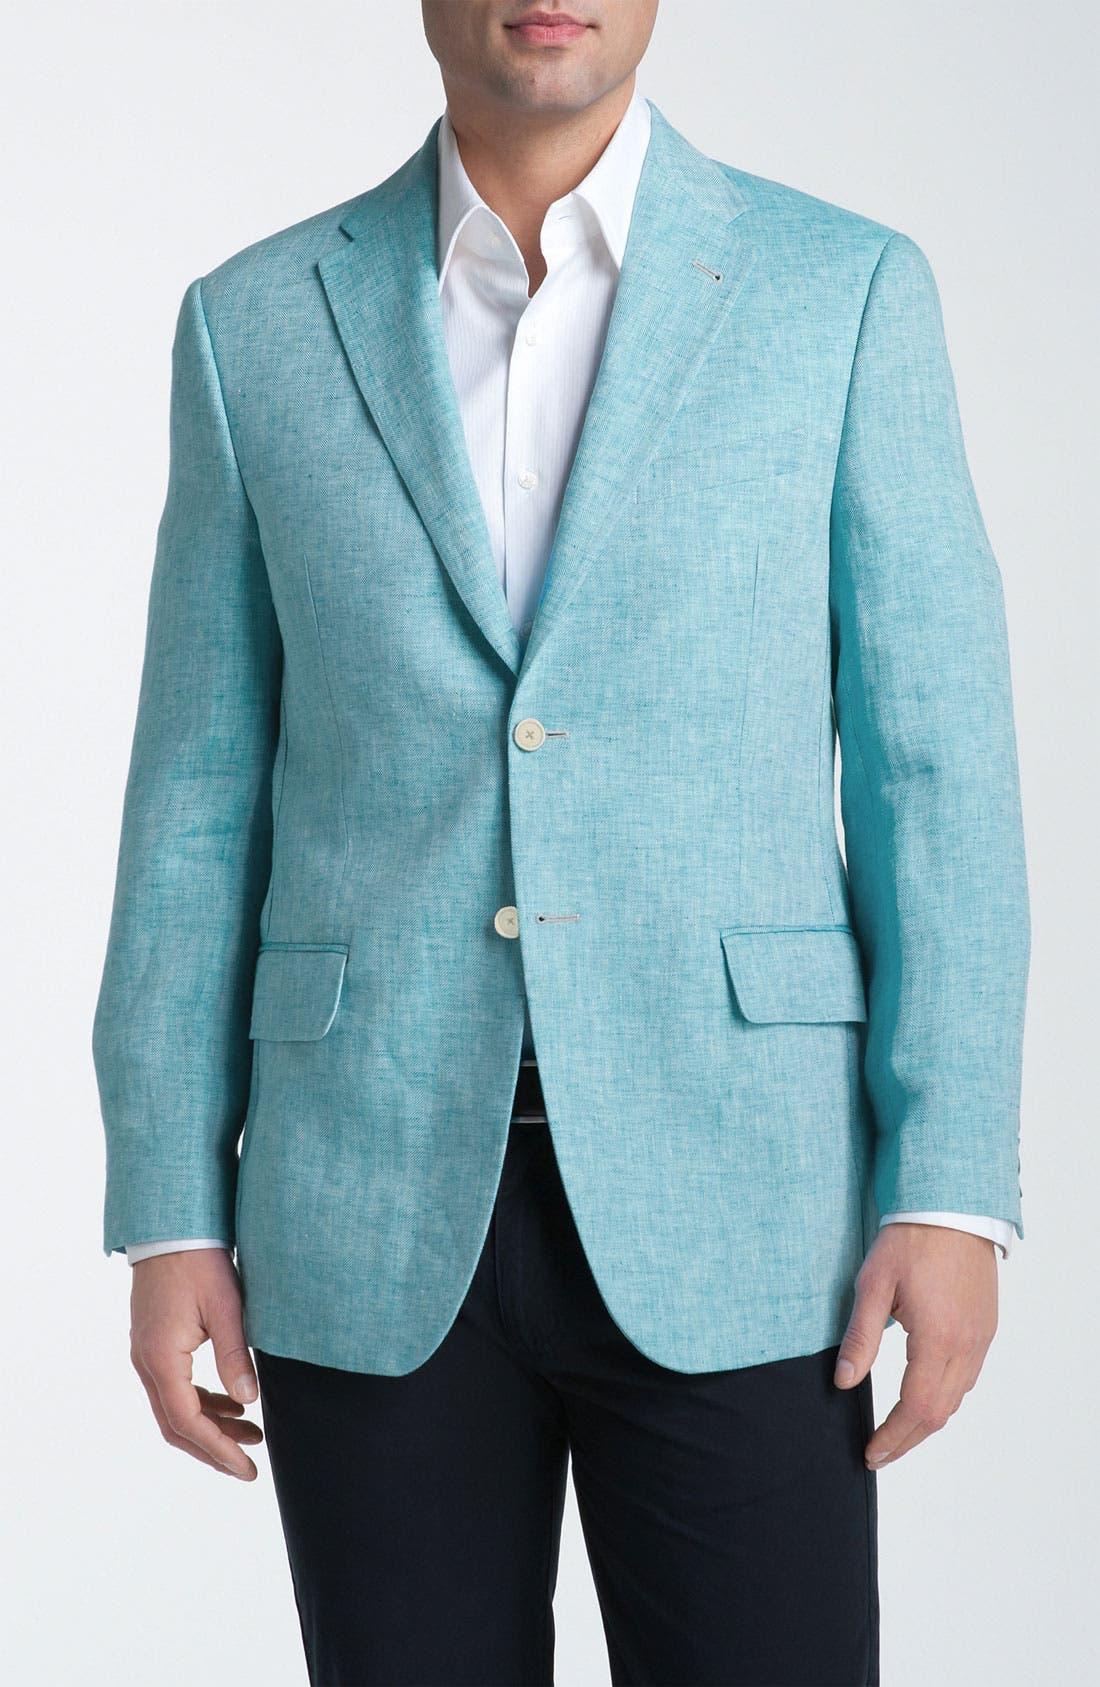 Alternate Image 1 Selected - Joseph Abboud Herringbone Linen Sportcoat